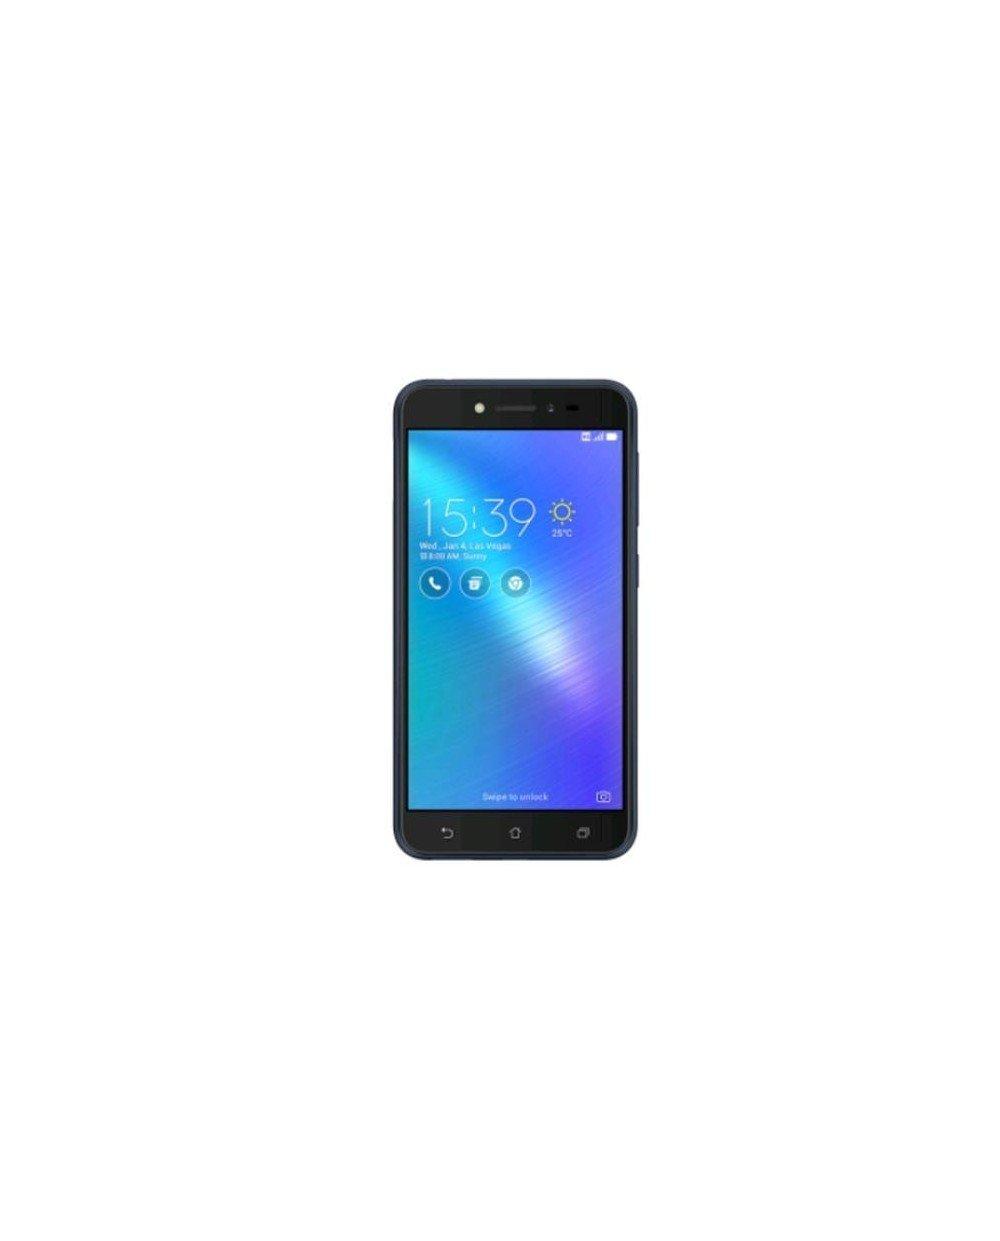 TIM ASUS Zenfone Live SIM Doble 4G 32GB Negro, Marina - Smartphone (12,7 cm (5